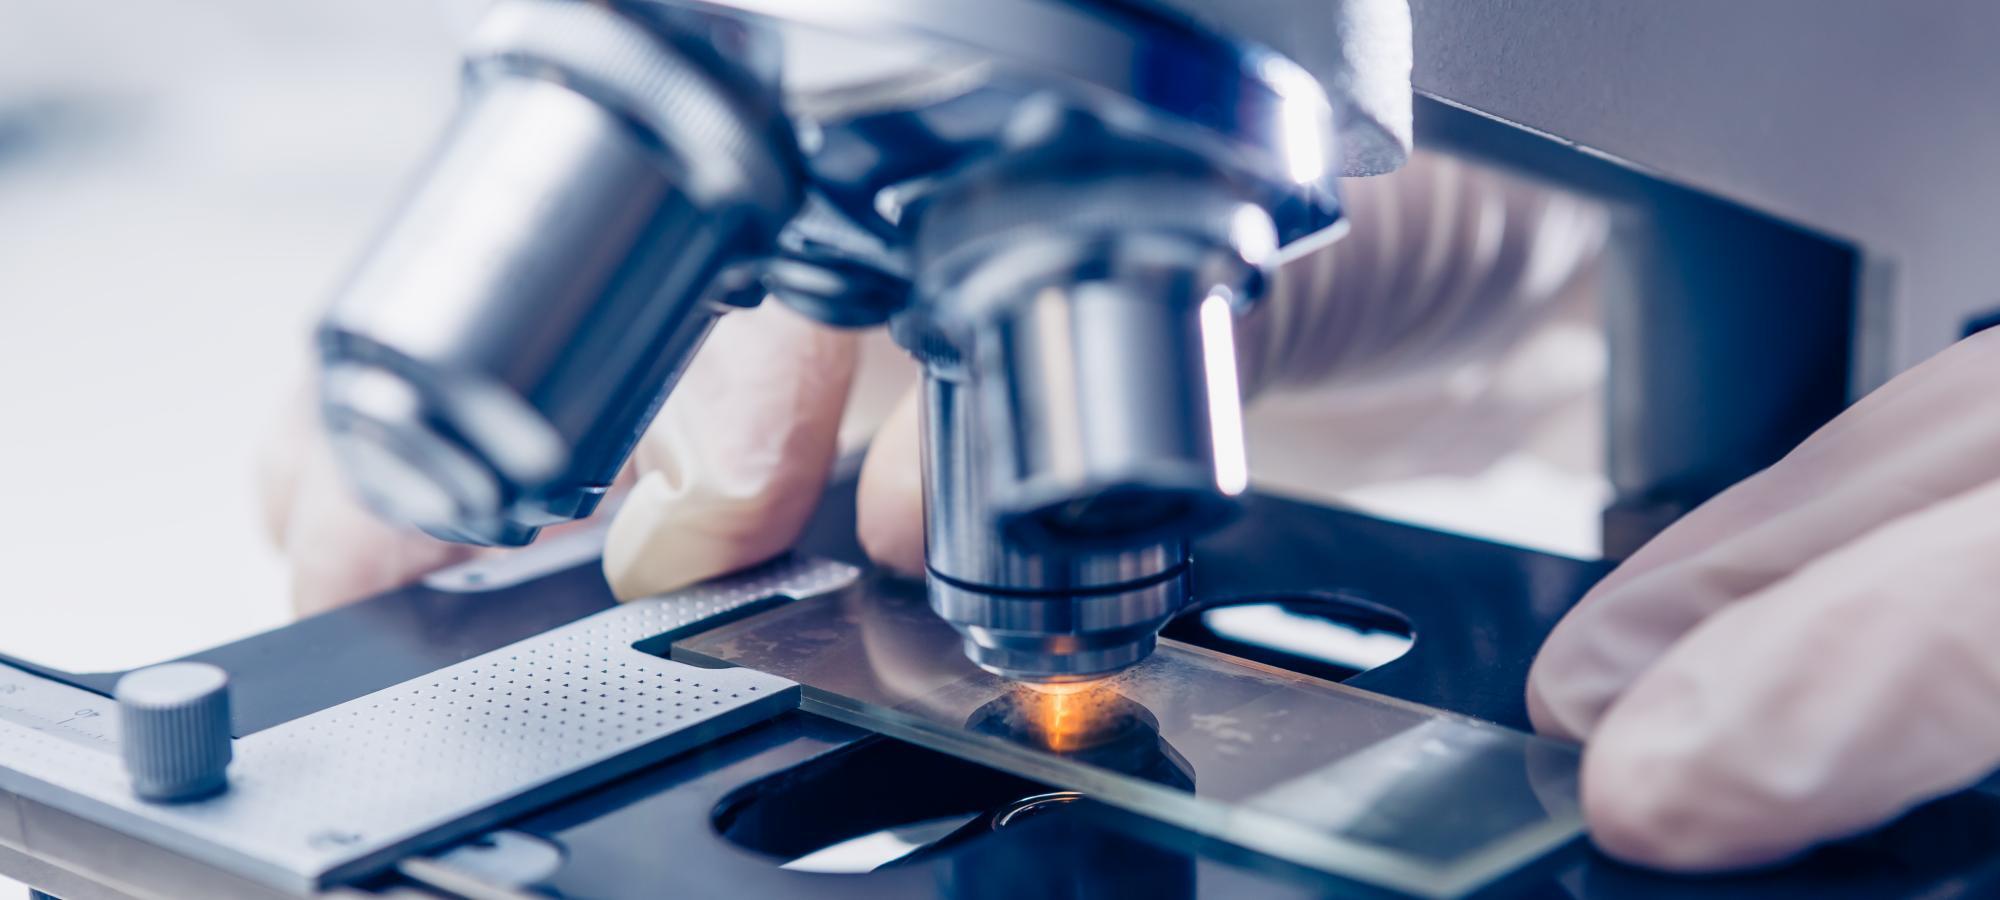 plin nanotechnology laboratory image